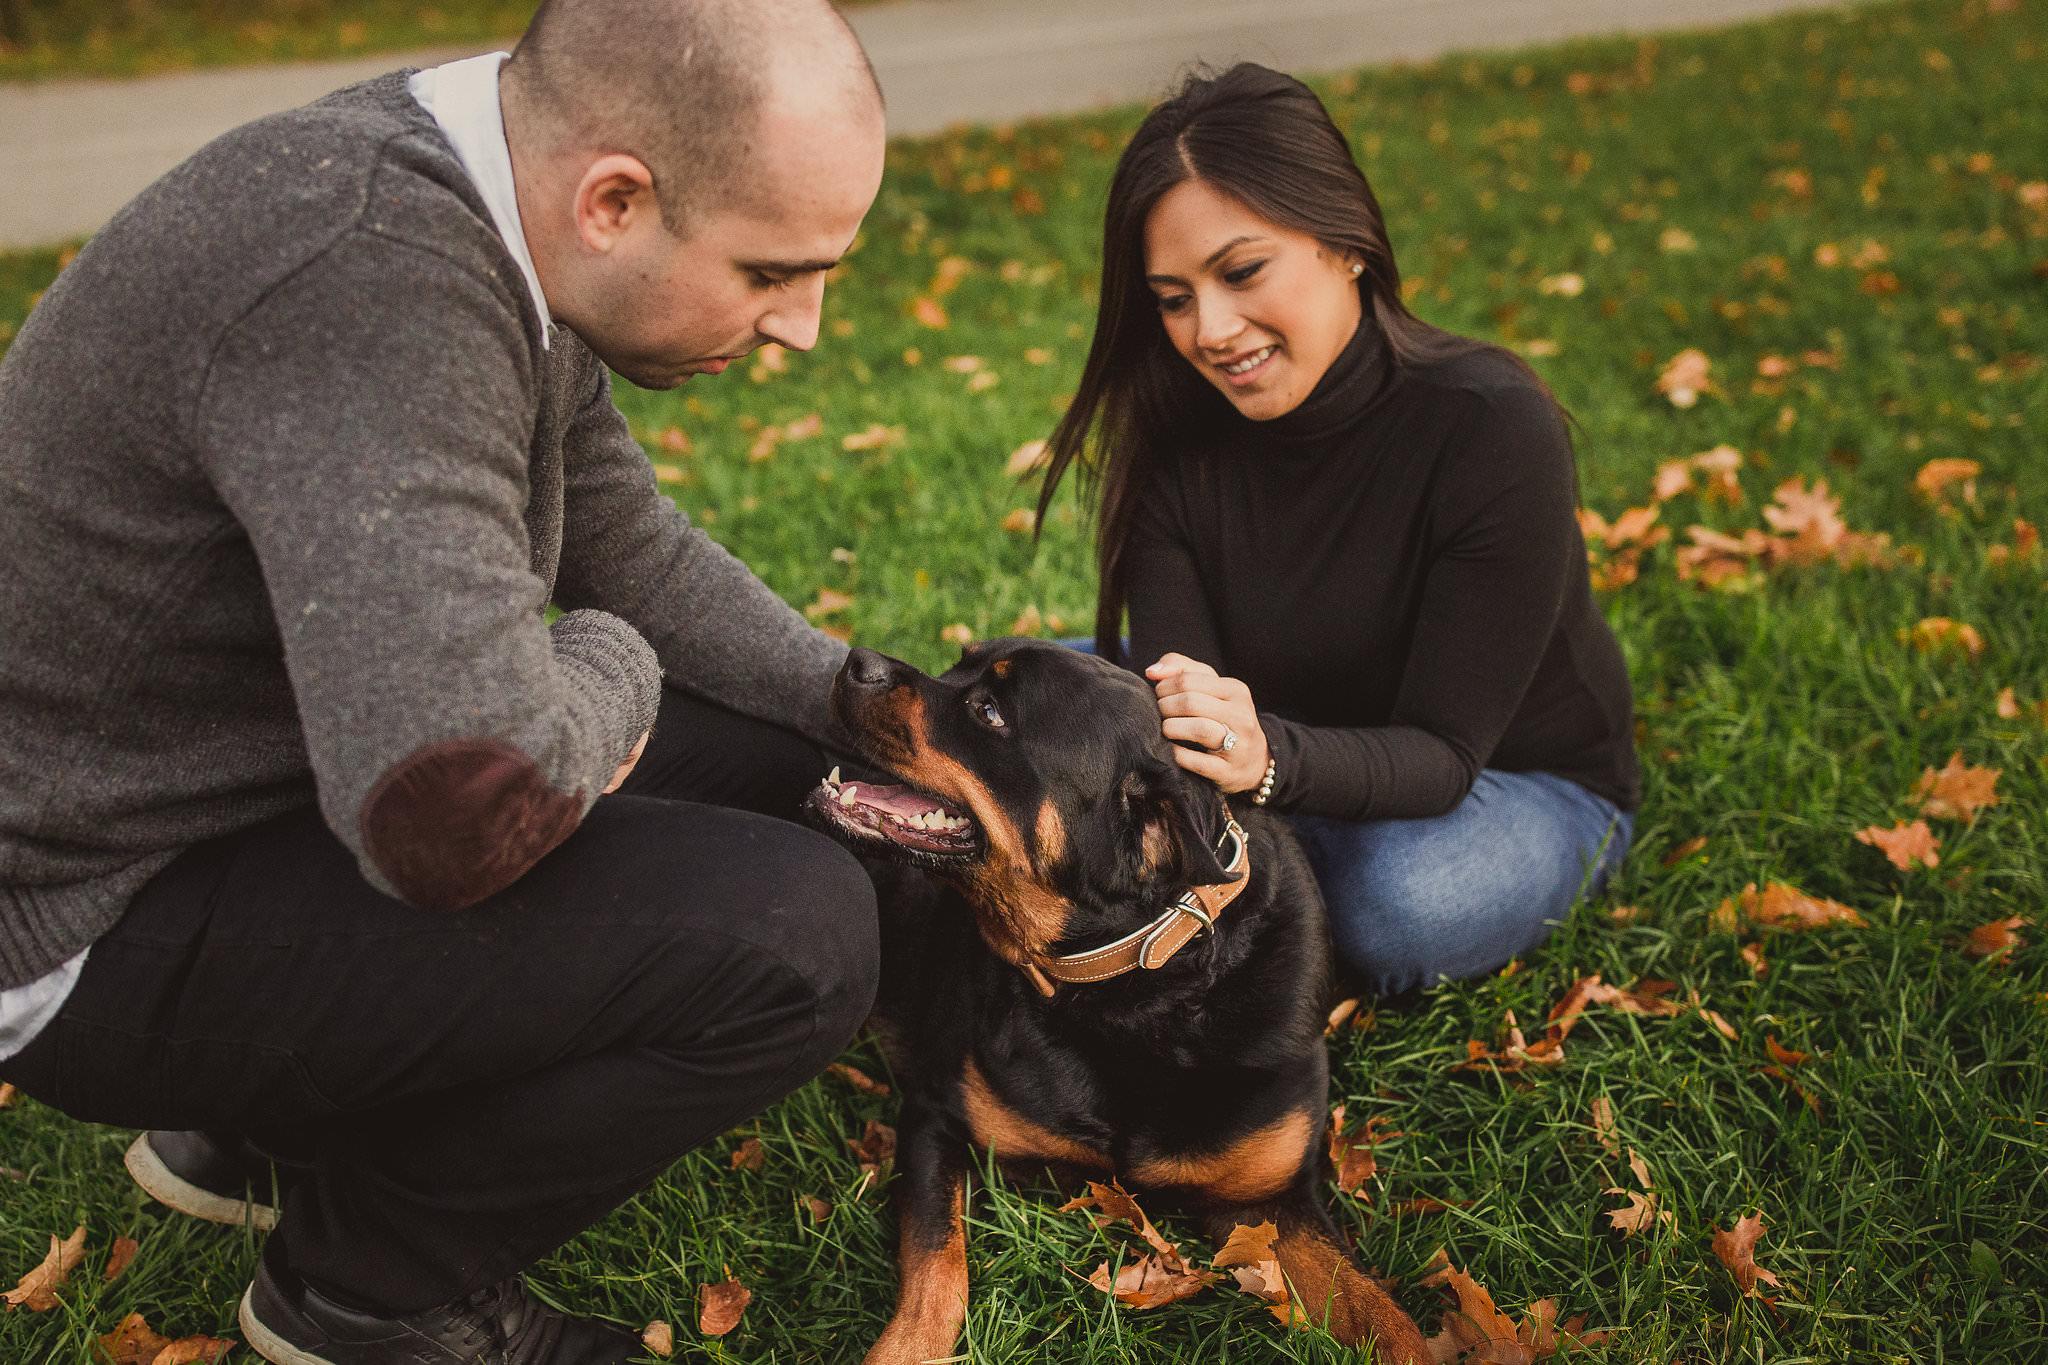 petticoat creek engagement photos, pickering engagement photo locations, engagement photos with your dog, engagement photo ideas with your dog